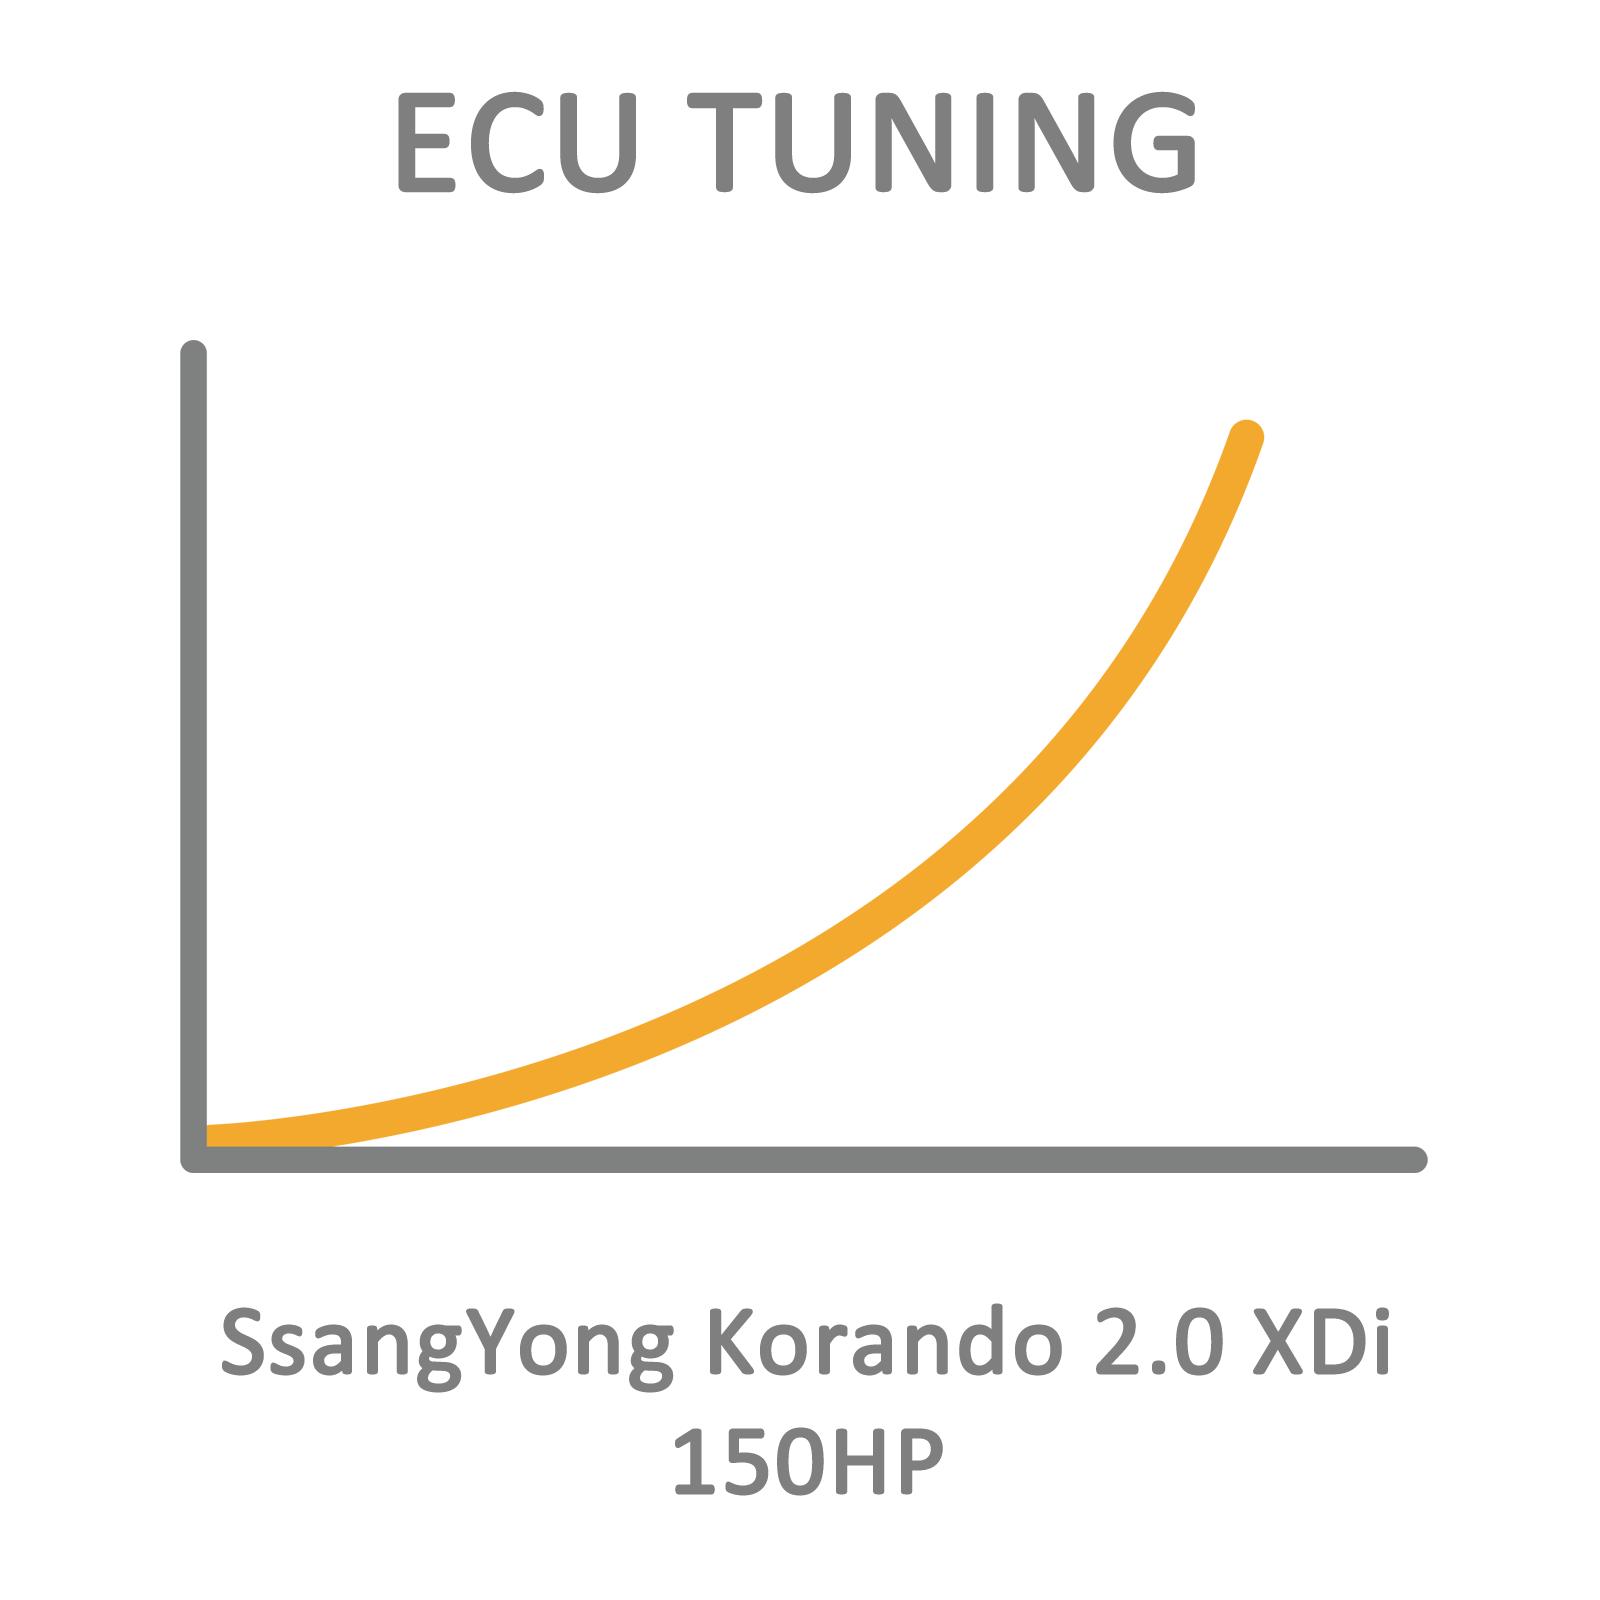 SsangYong Korando 2.0 XDi 150HP ECU Tuning Remapping